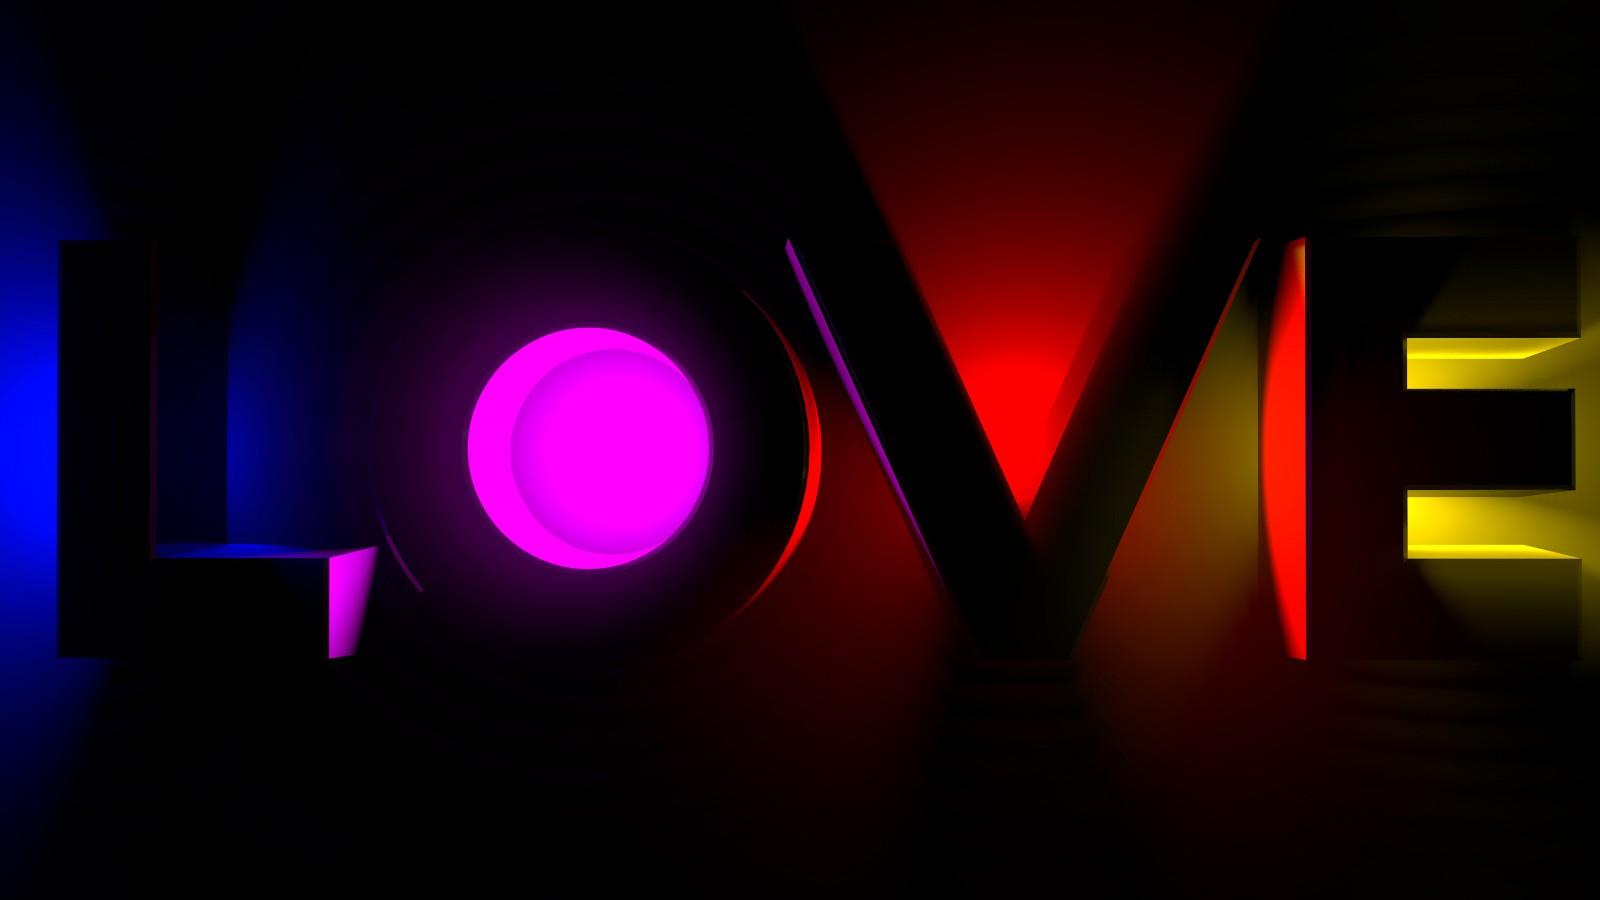 Cool 3d Ipad Wallpapers Neon Love 4k Wallpapers Hd Wallpapers Id 24854